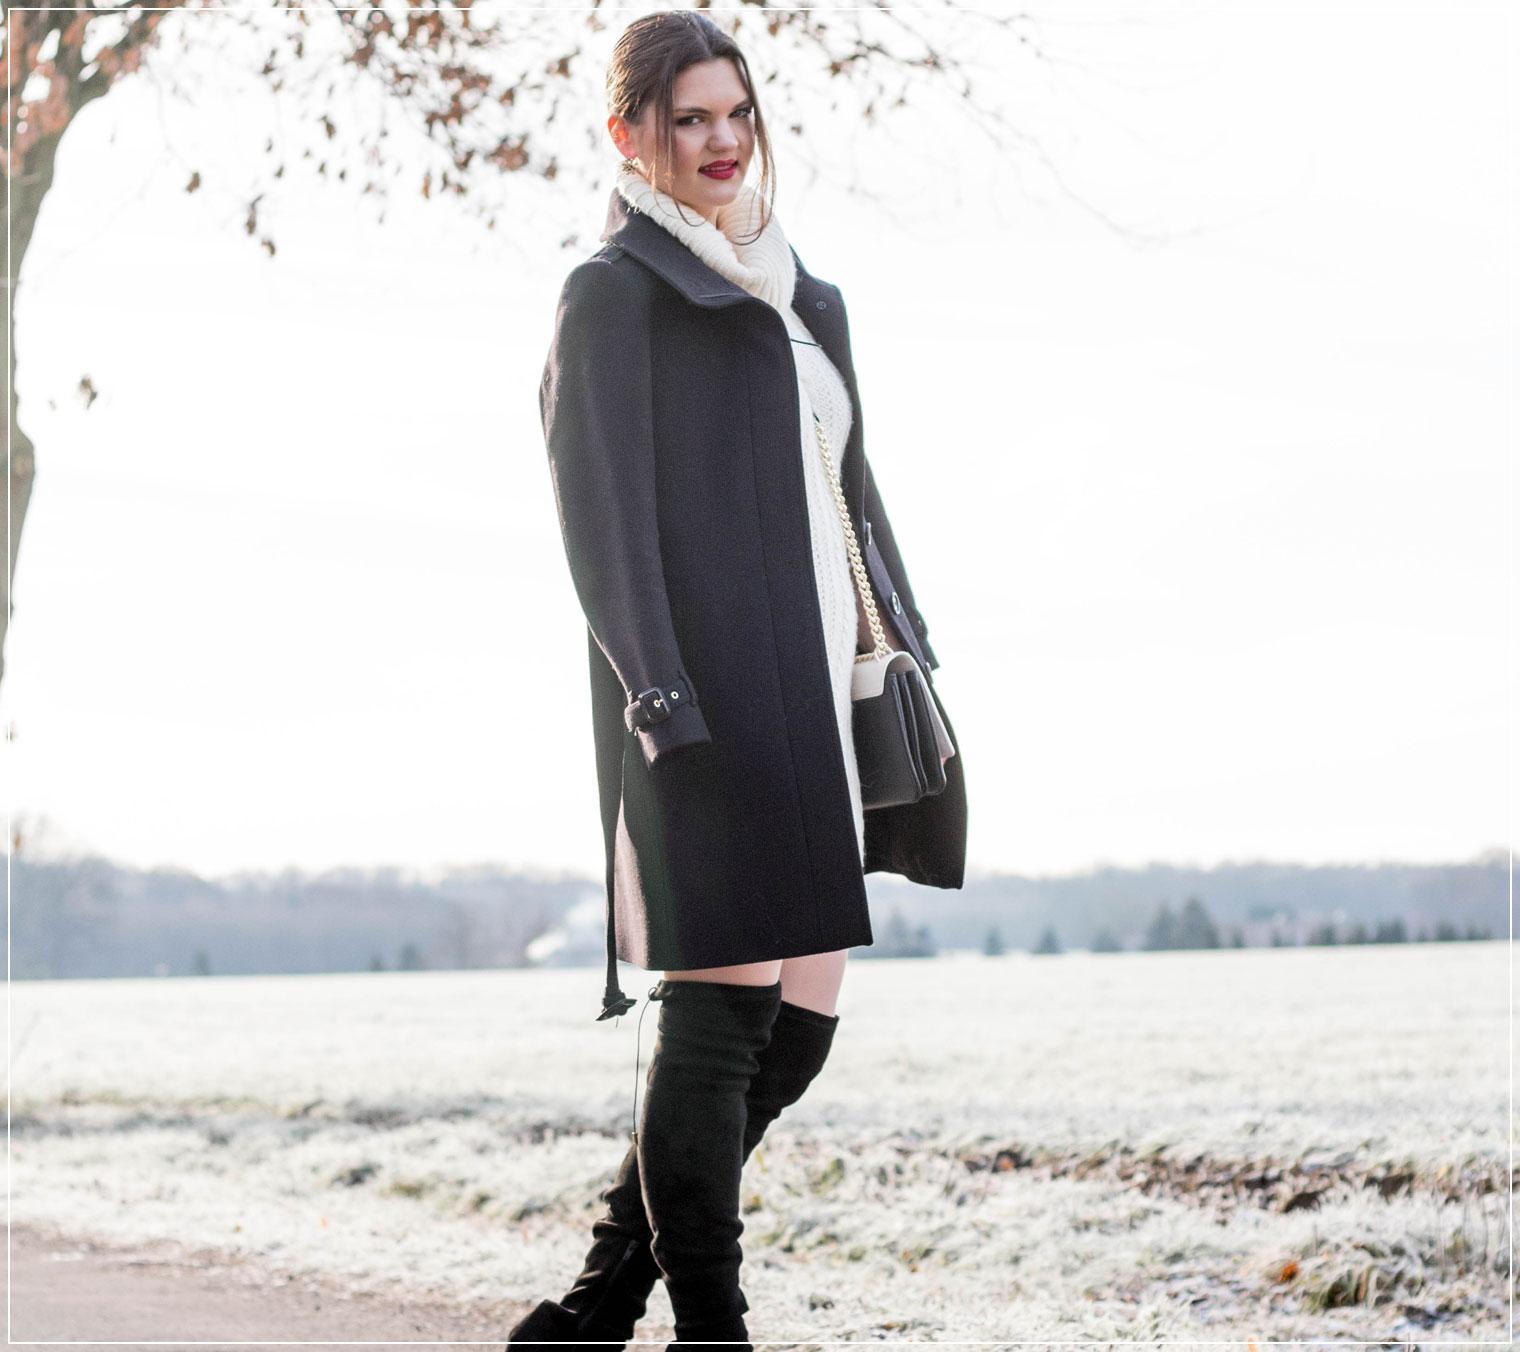 Winterjacken, Wintermäntel, Winteroutfit, Wollmäntel, Teddyjacken, Modetrends, Fashion, Modeblog, Ruhrgebiet, Herbstmode, Bloggerin, Fashionblog